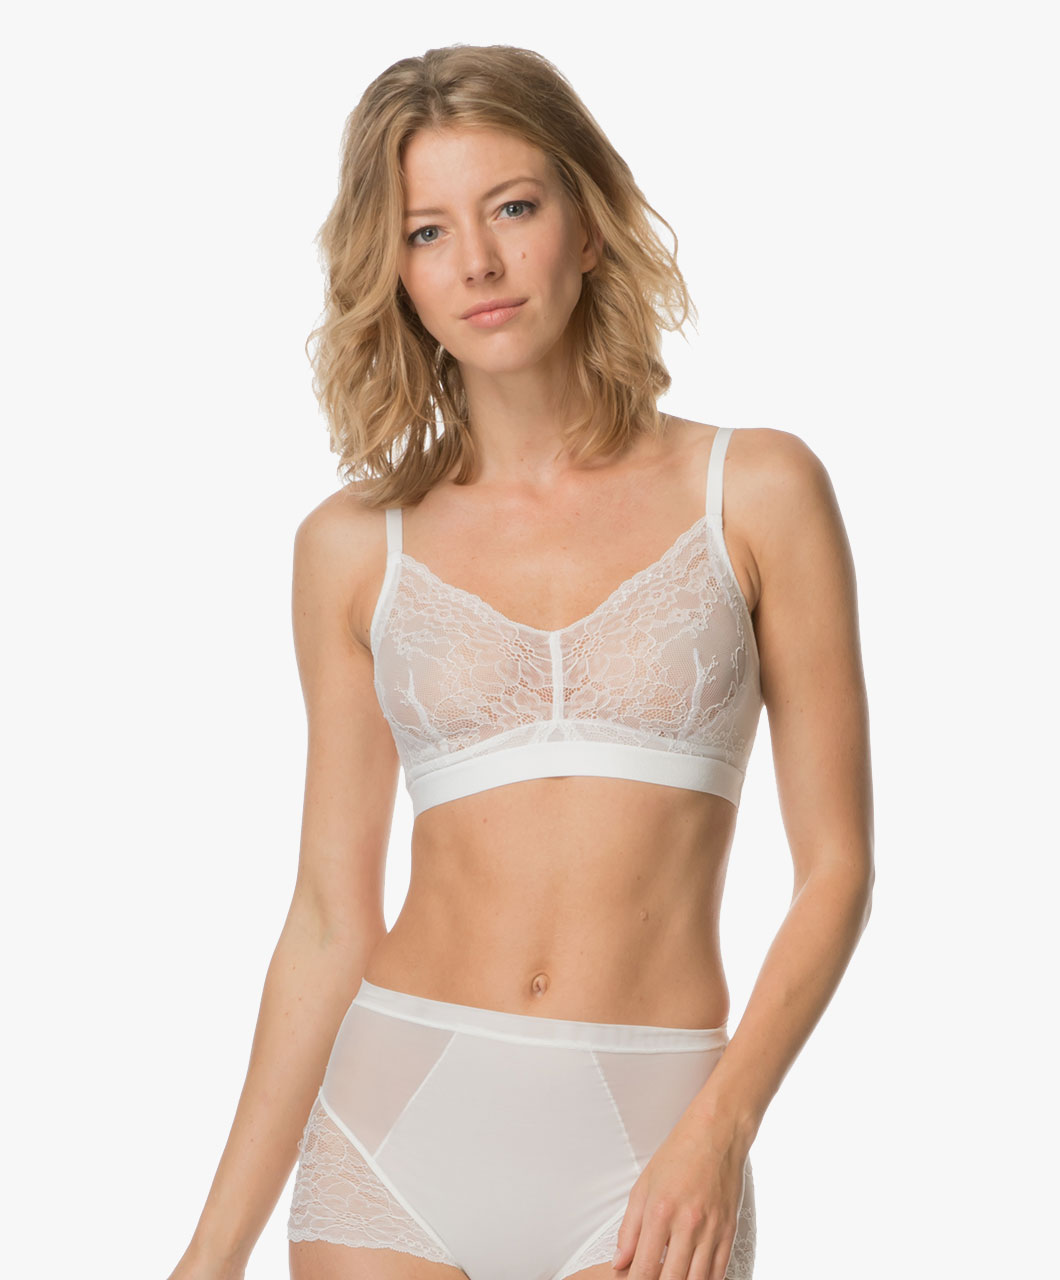 SPANX® Spotlight on Lace Bralette - Clean White